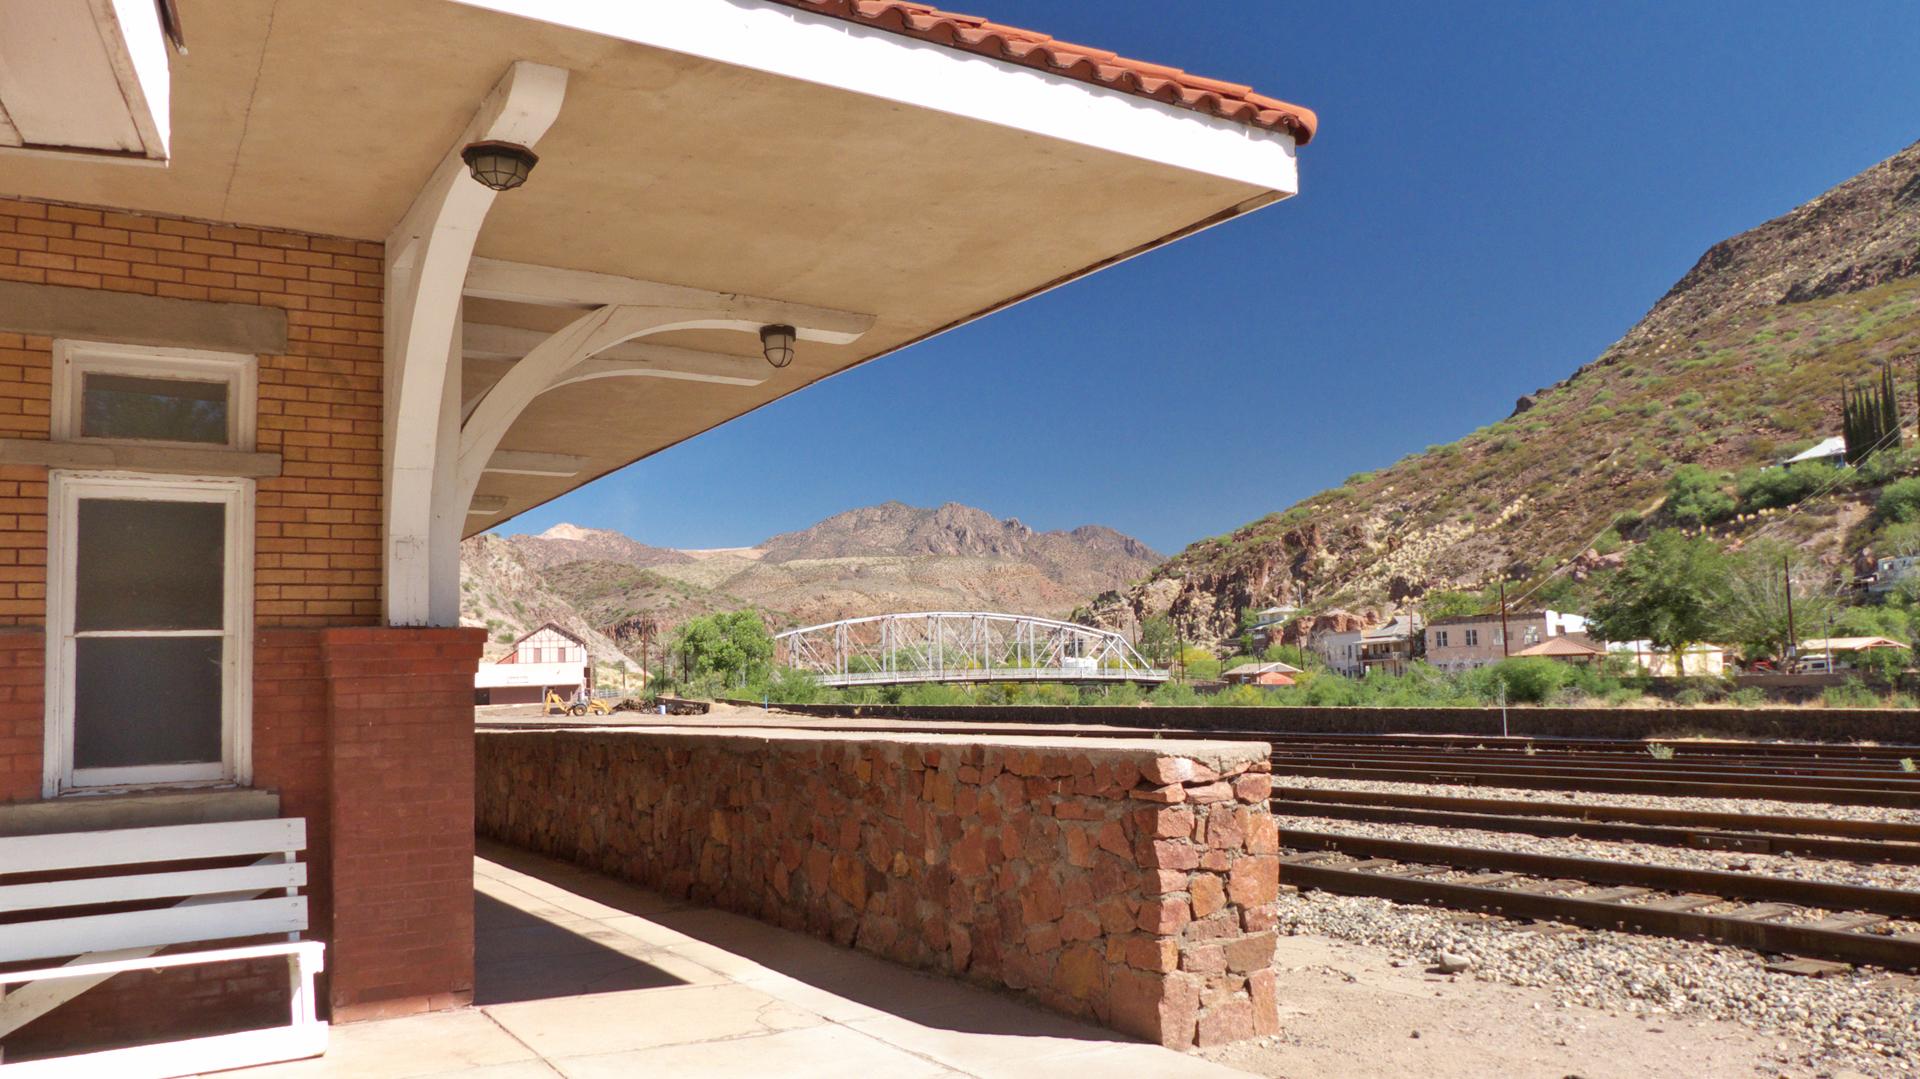 Clifton Train Station